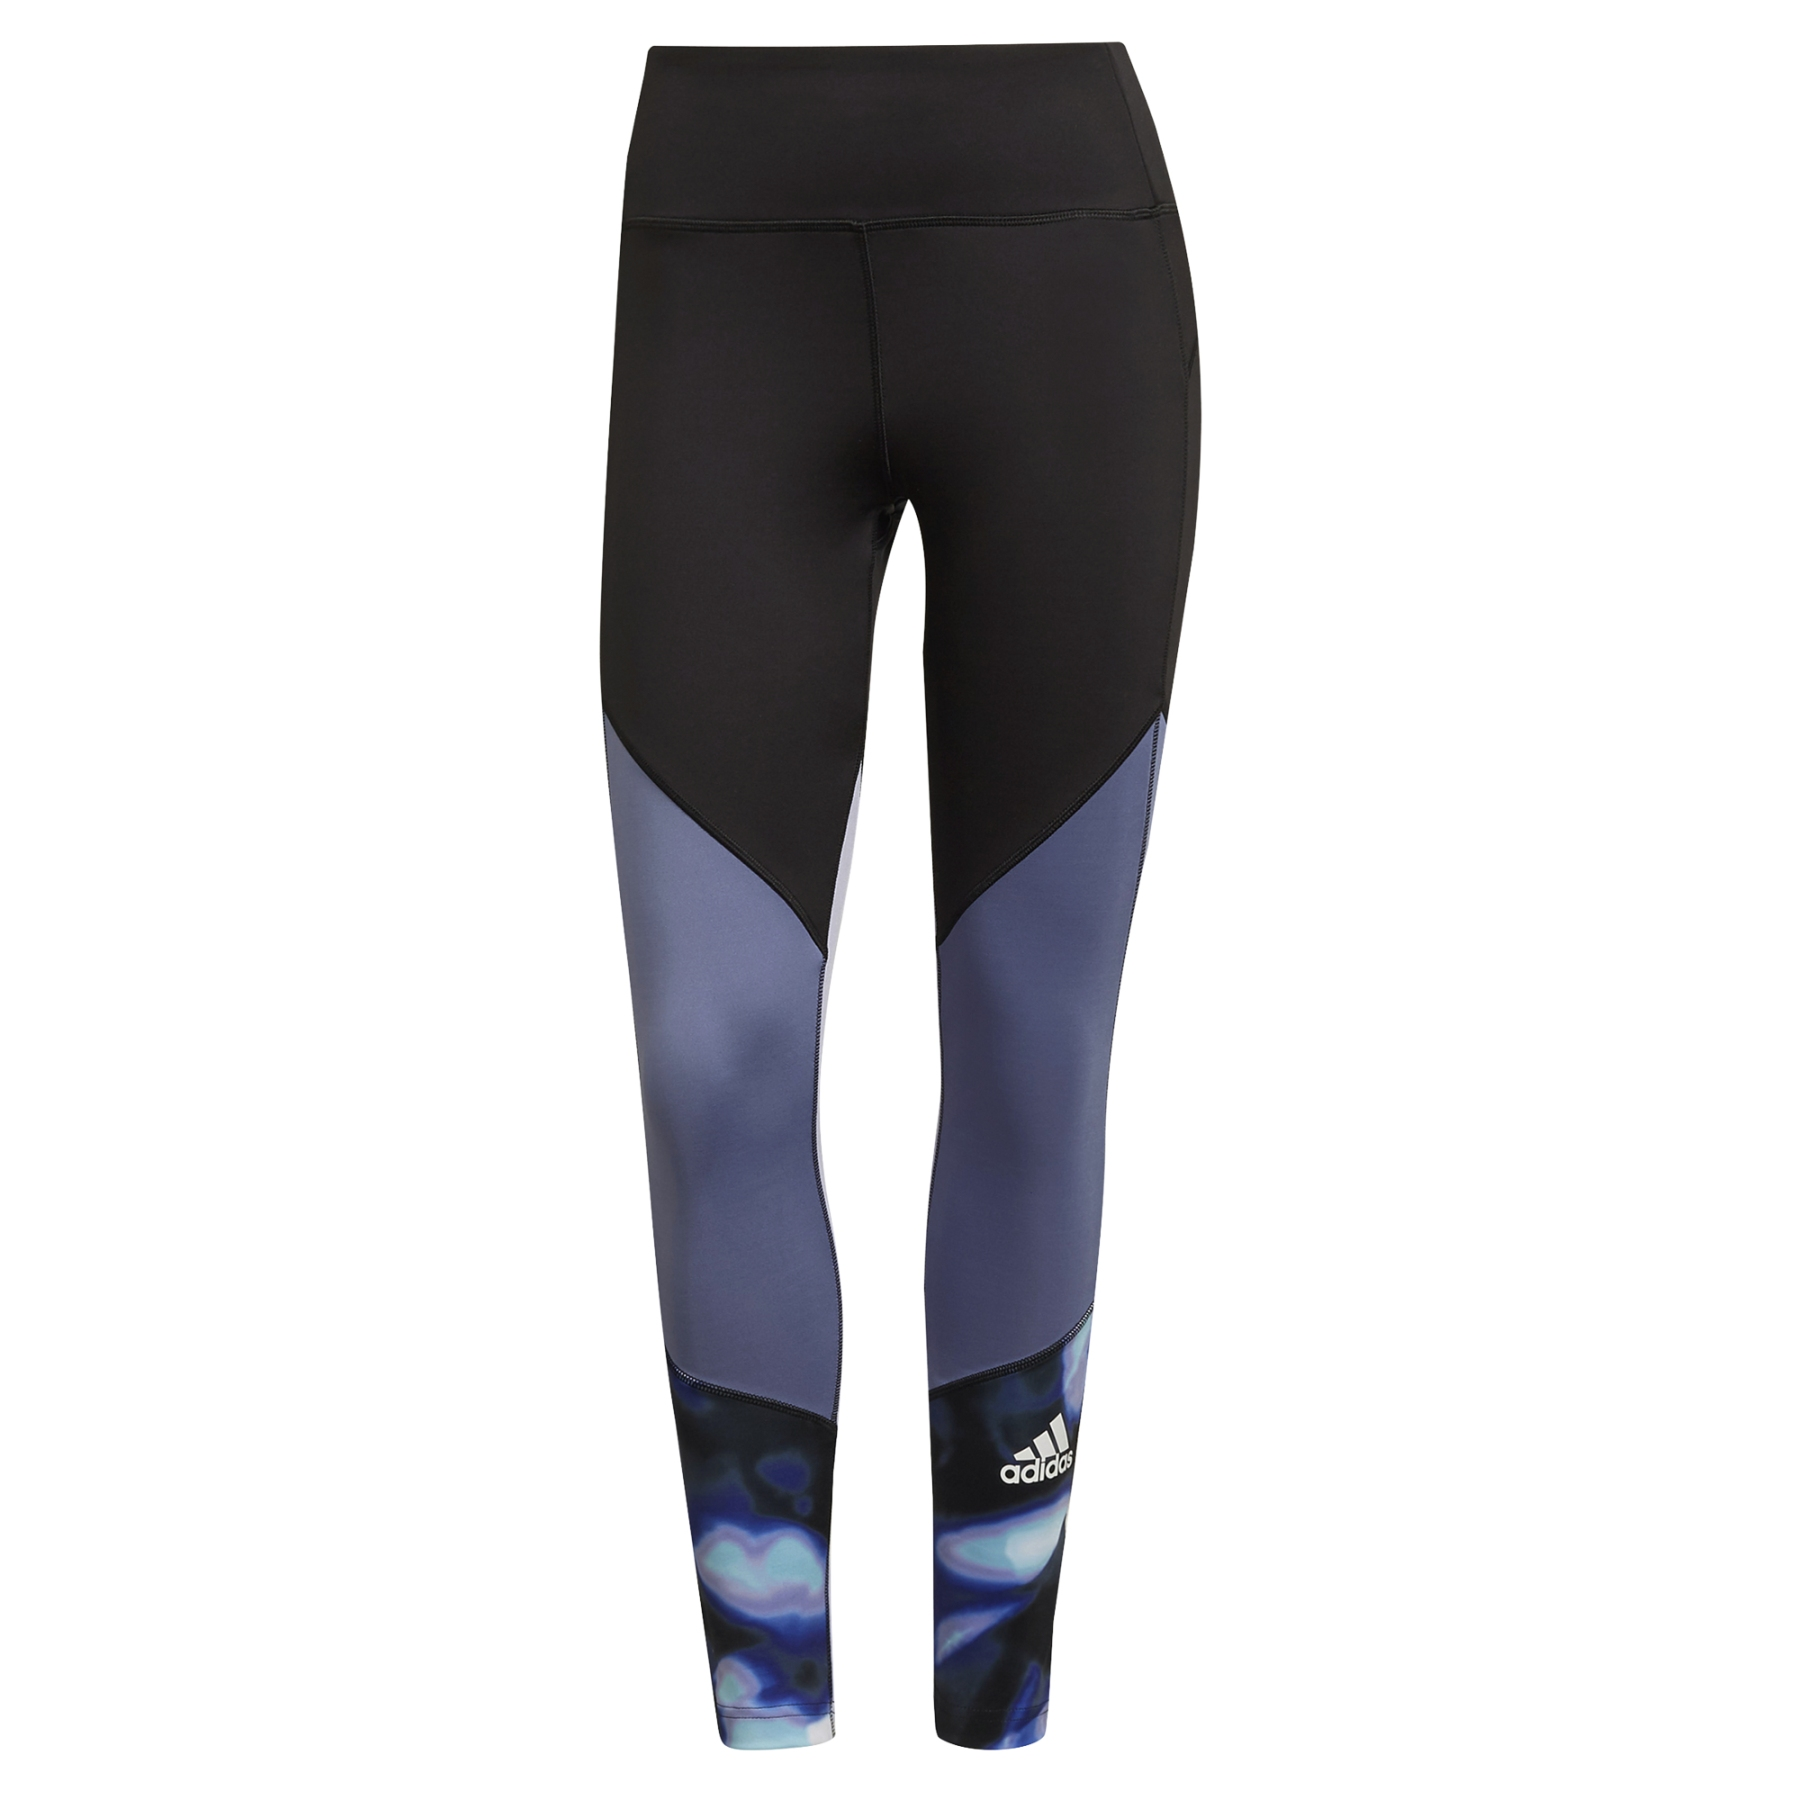 adidas Women's FeelBrilliant AEROREADY You for You Printed Sport 7/8-Tight - black/orbit violet GS3918